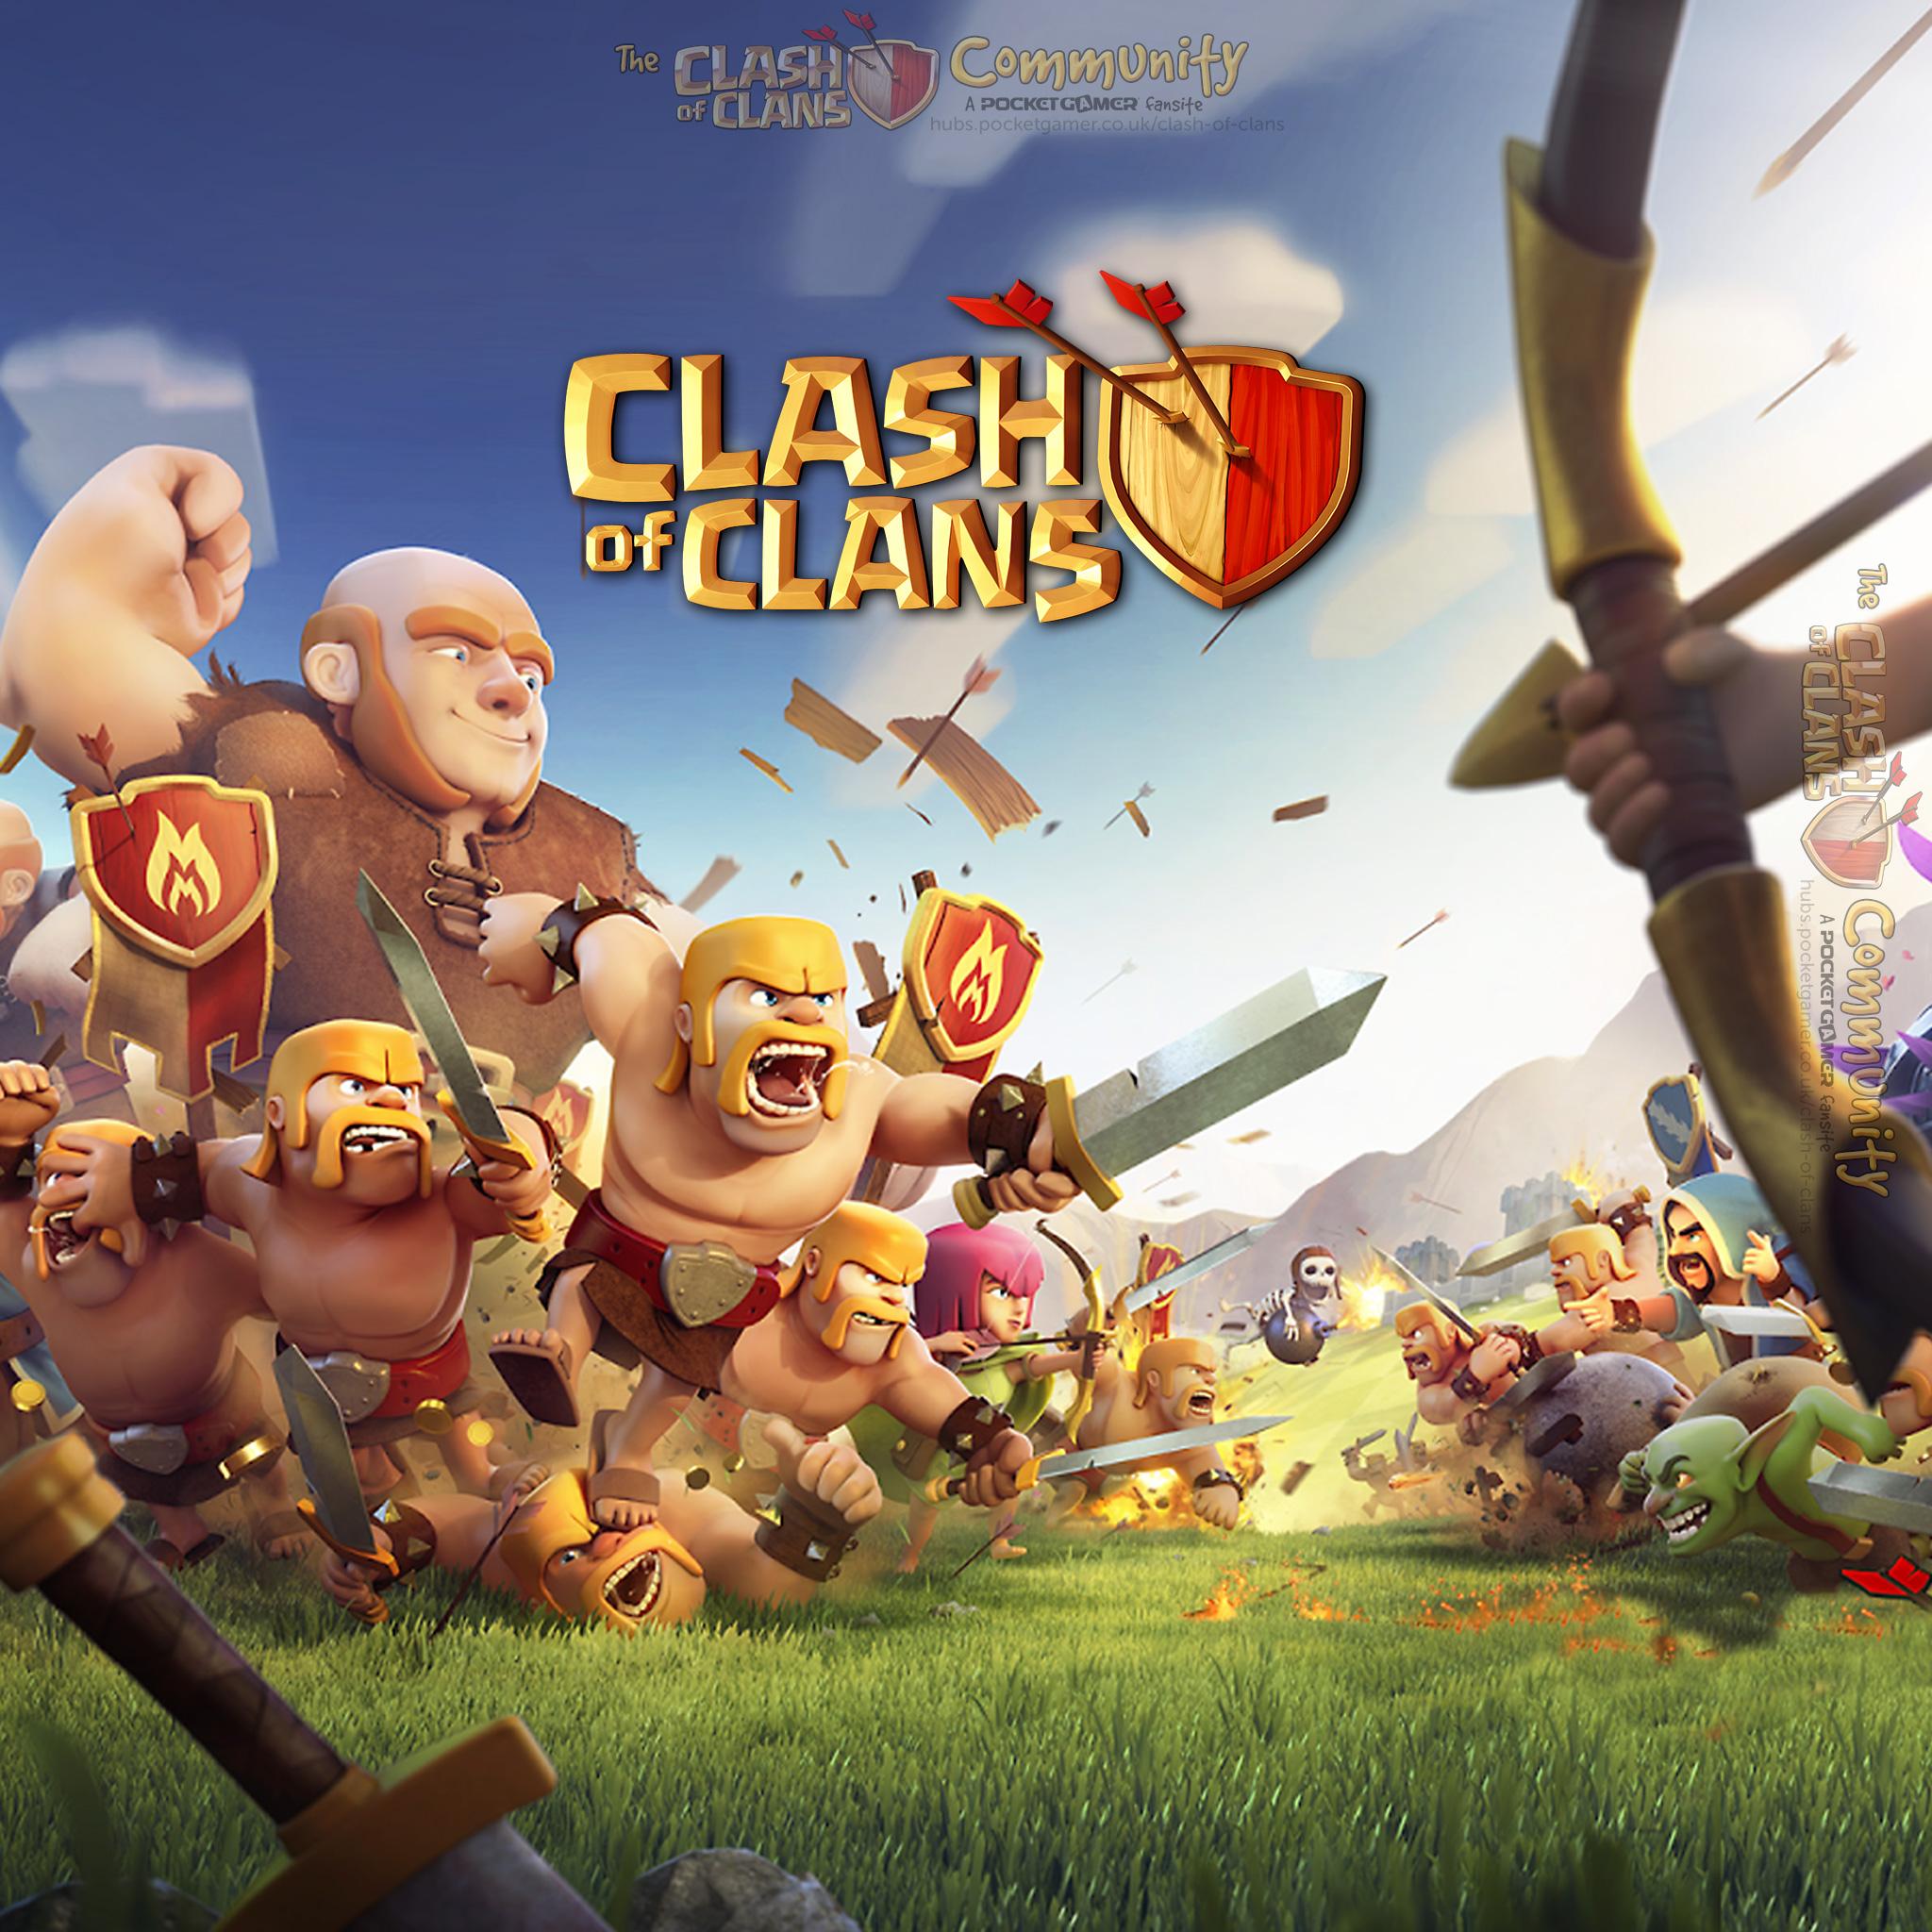 Clash of Clans iPad Wallpaper